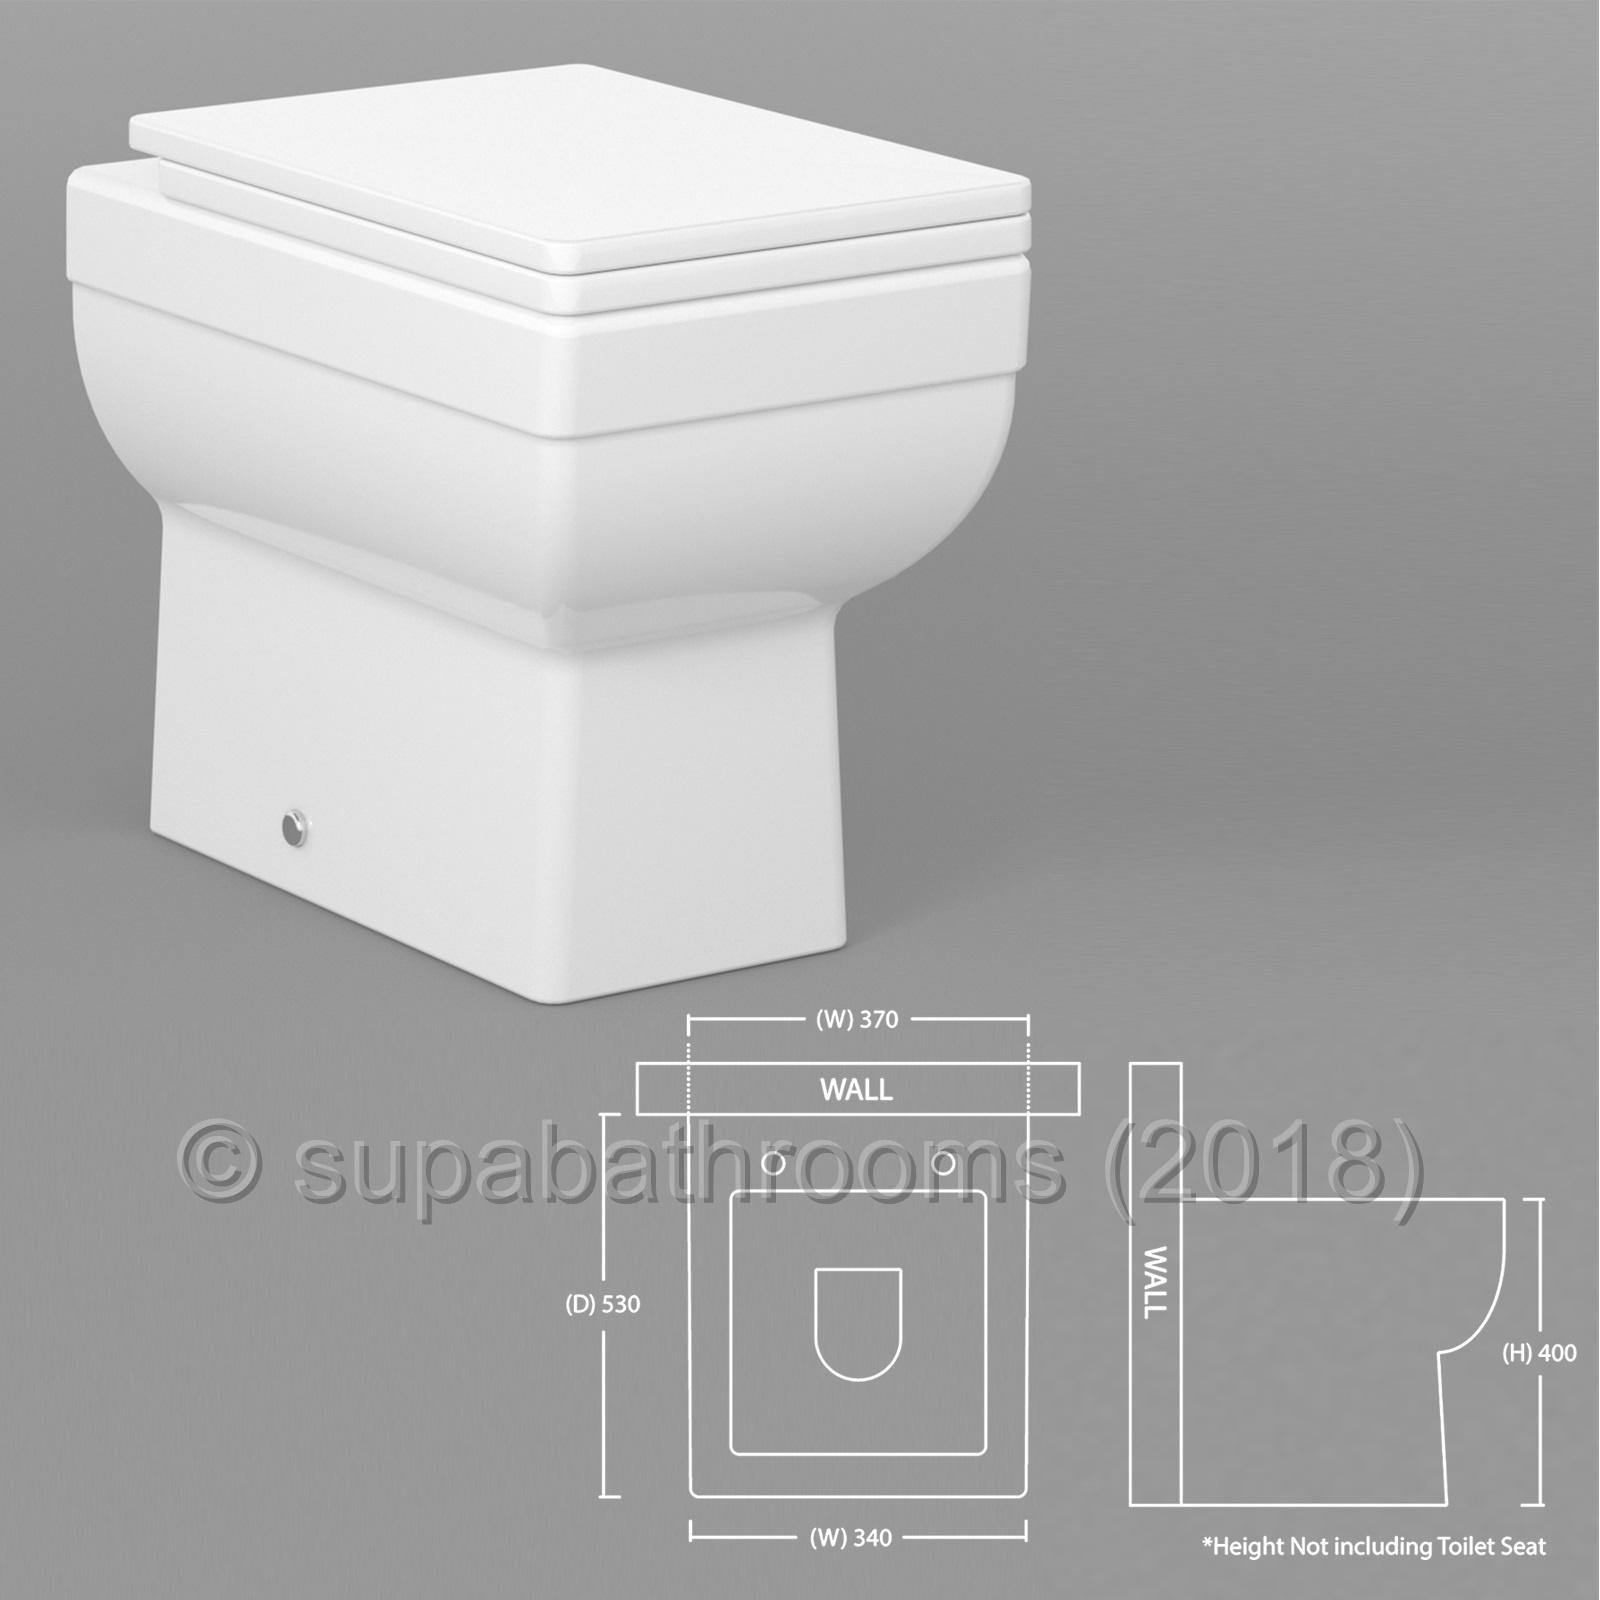 Bathroom Vanity Back To Wall Unit Wc Toilet Pan Cistern Seat